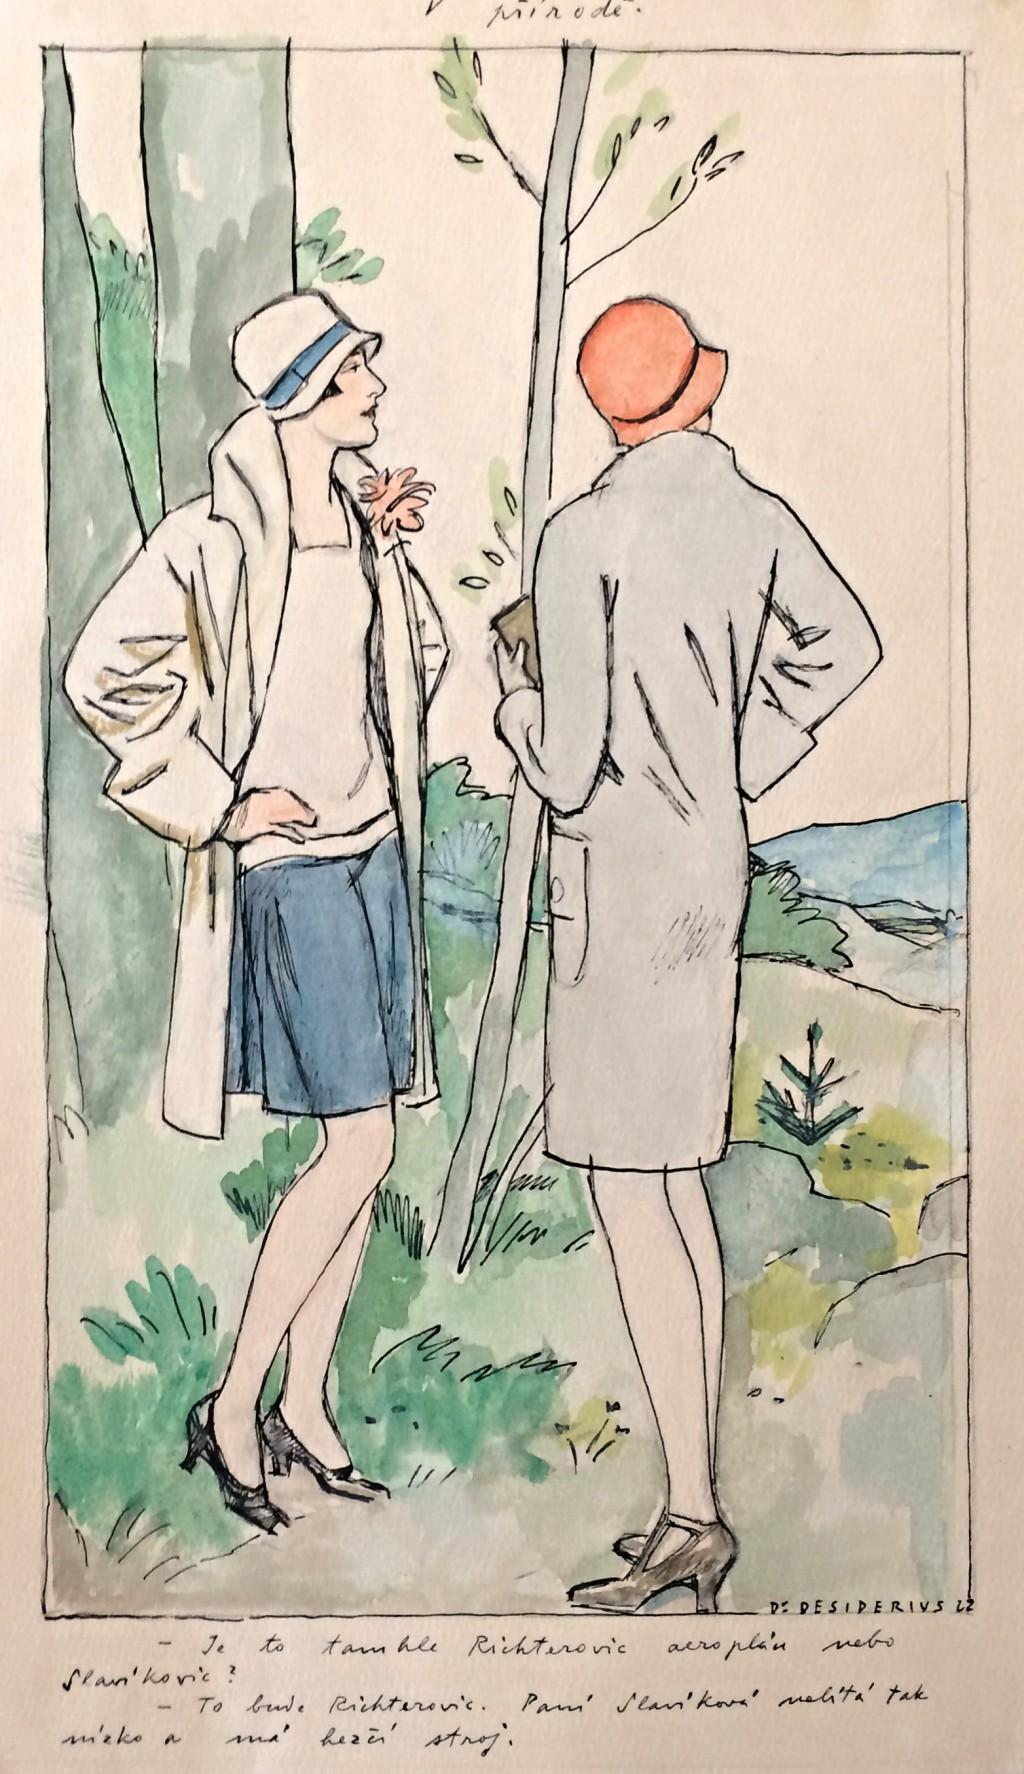 Desiderius (Hugo Bottinger) 1880 - 1934 : V přírodě